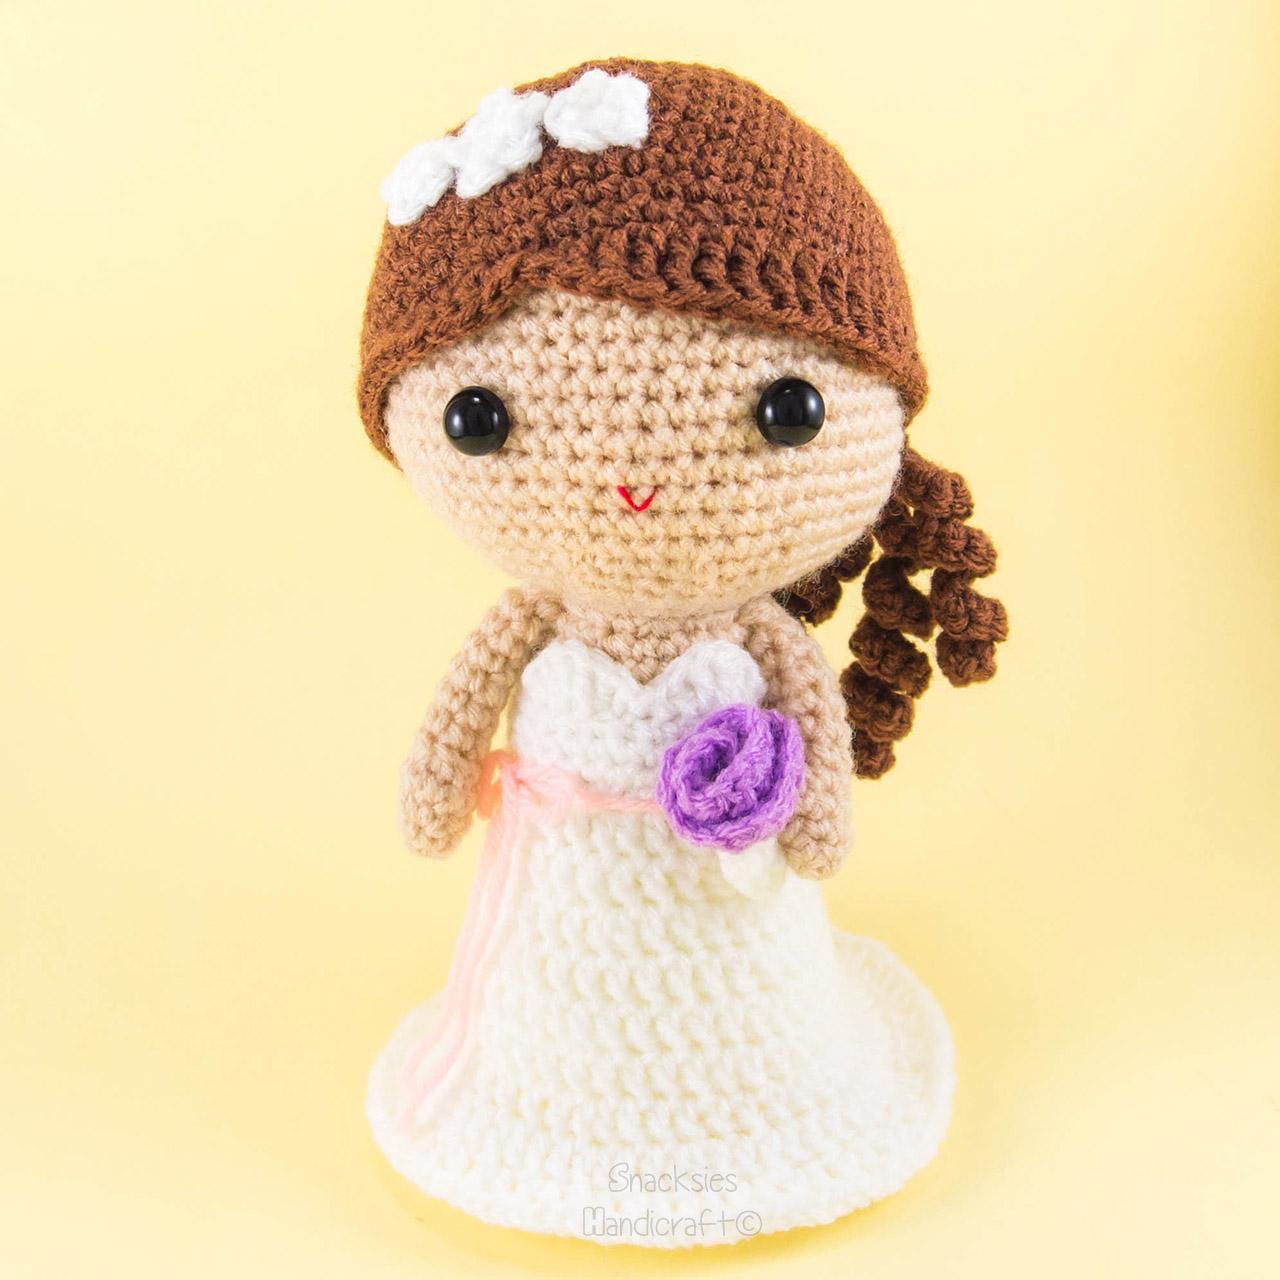 Bride Amigurumi Crochet ~ Snacksies Handicraft Corner